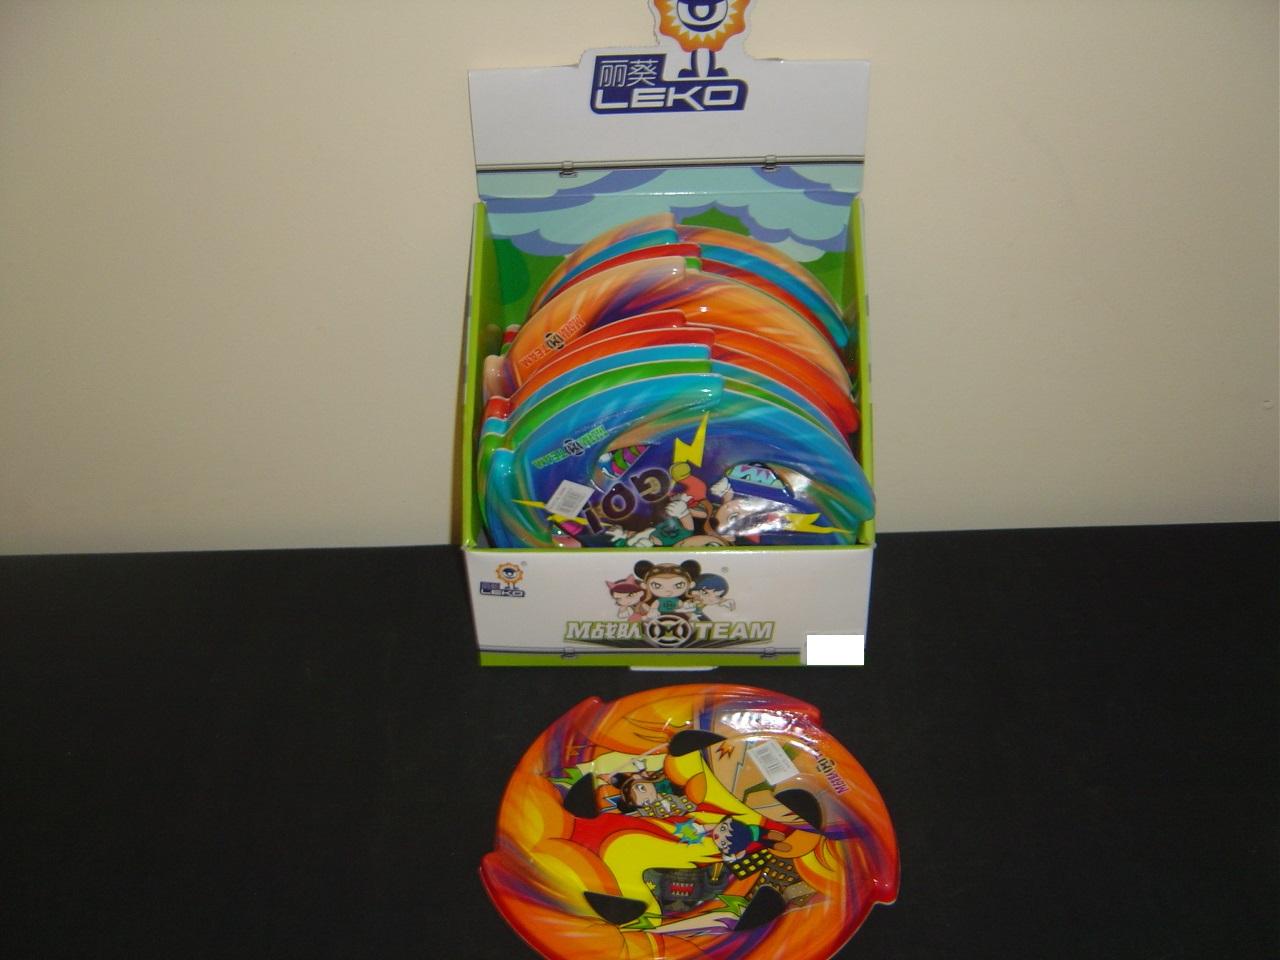 LEKO Toy set from Mercury Wholesalers